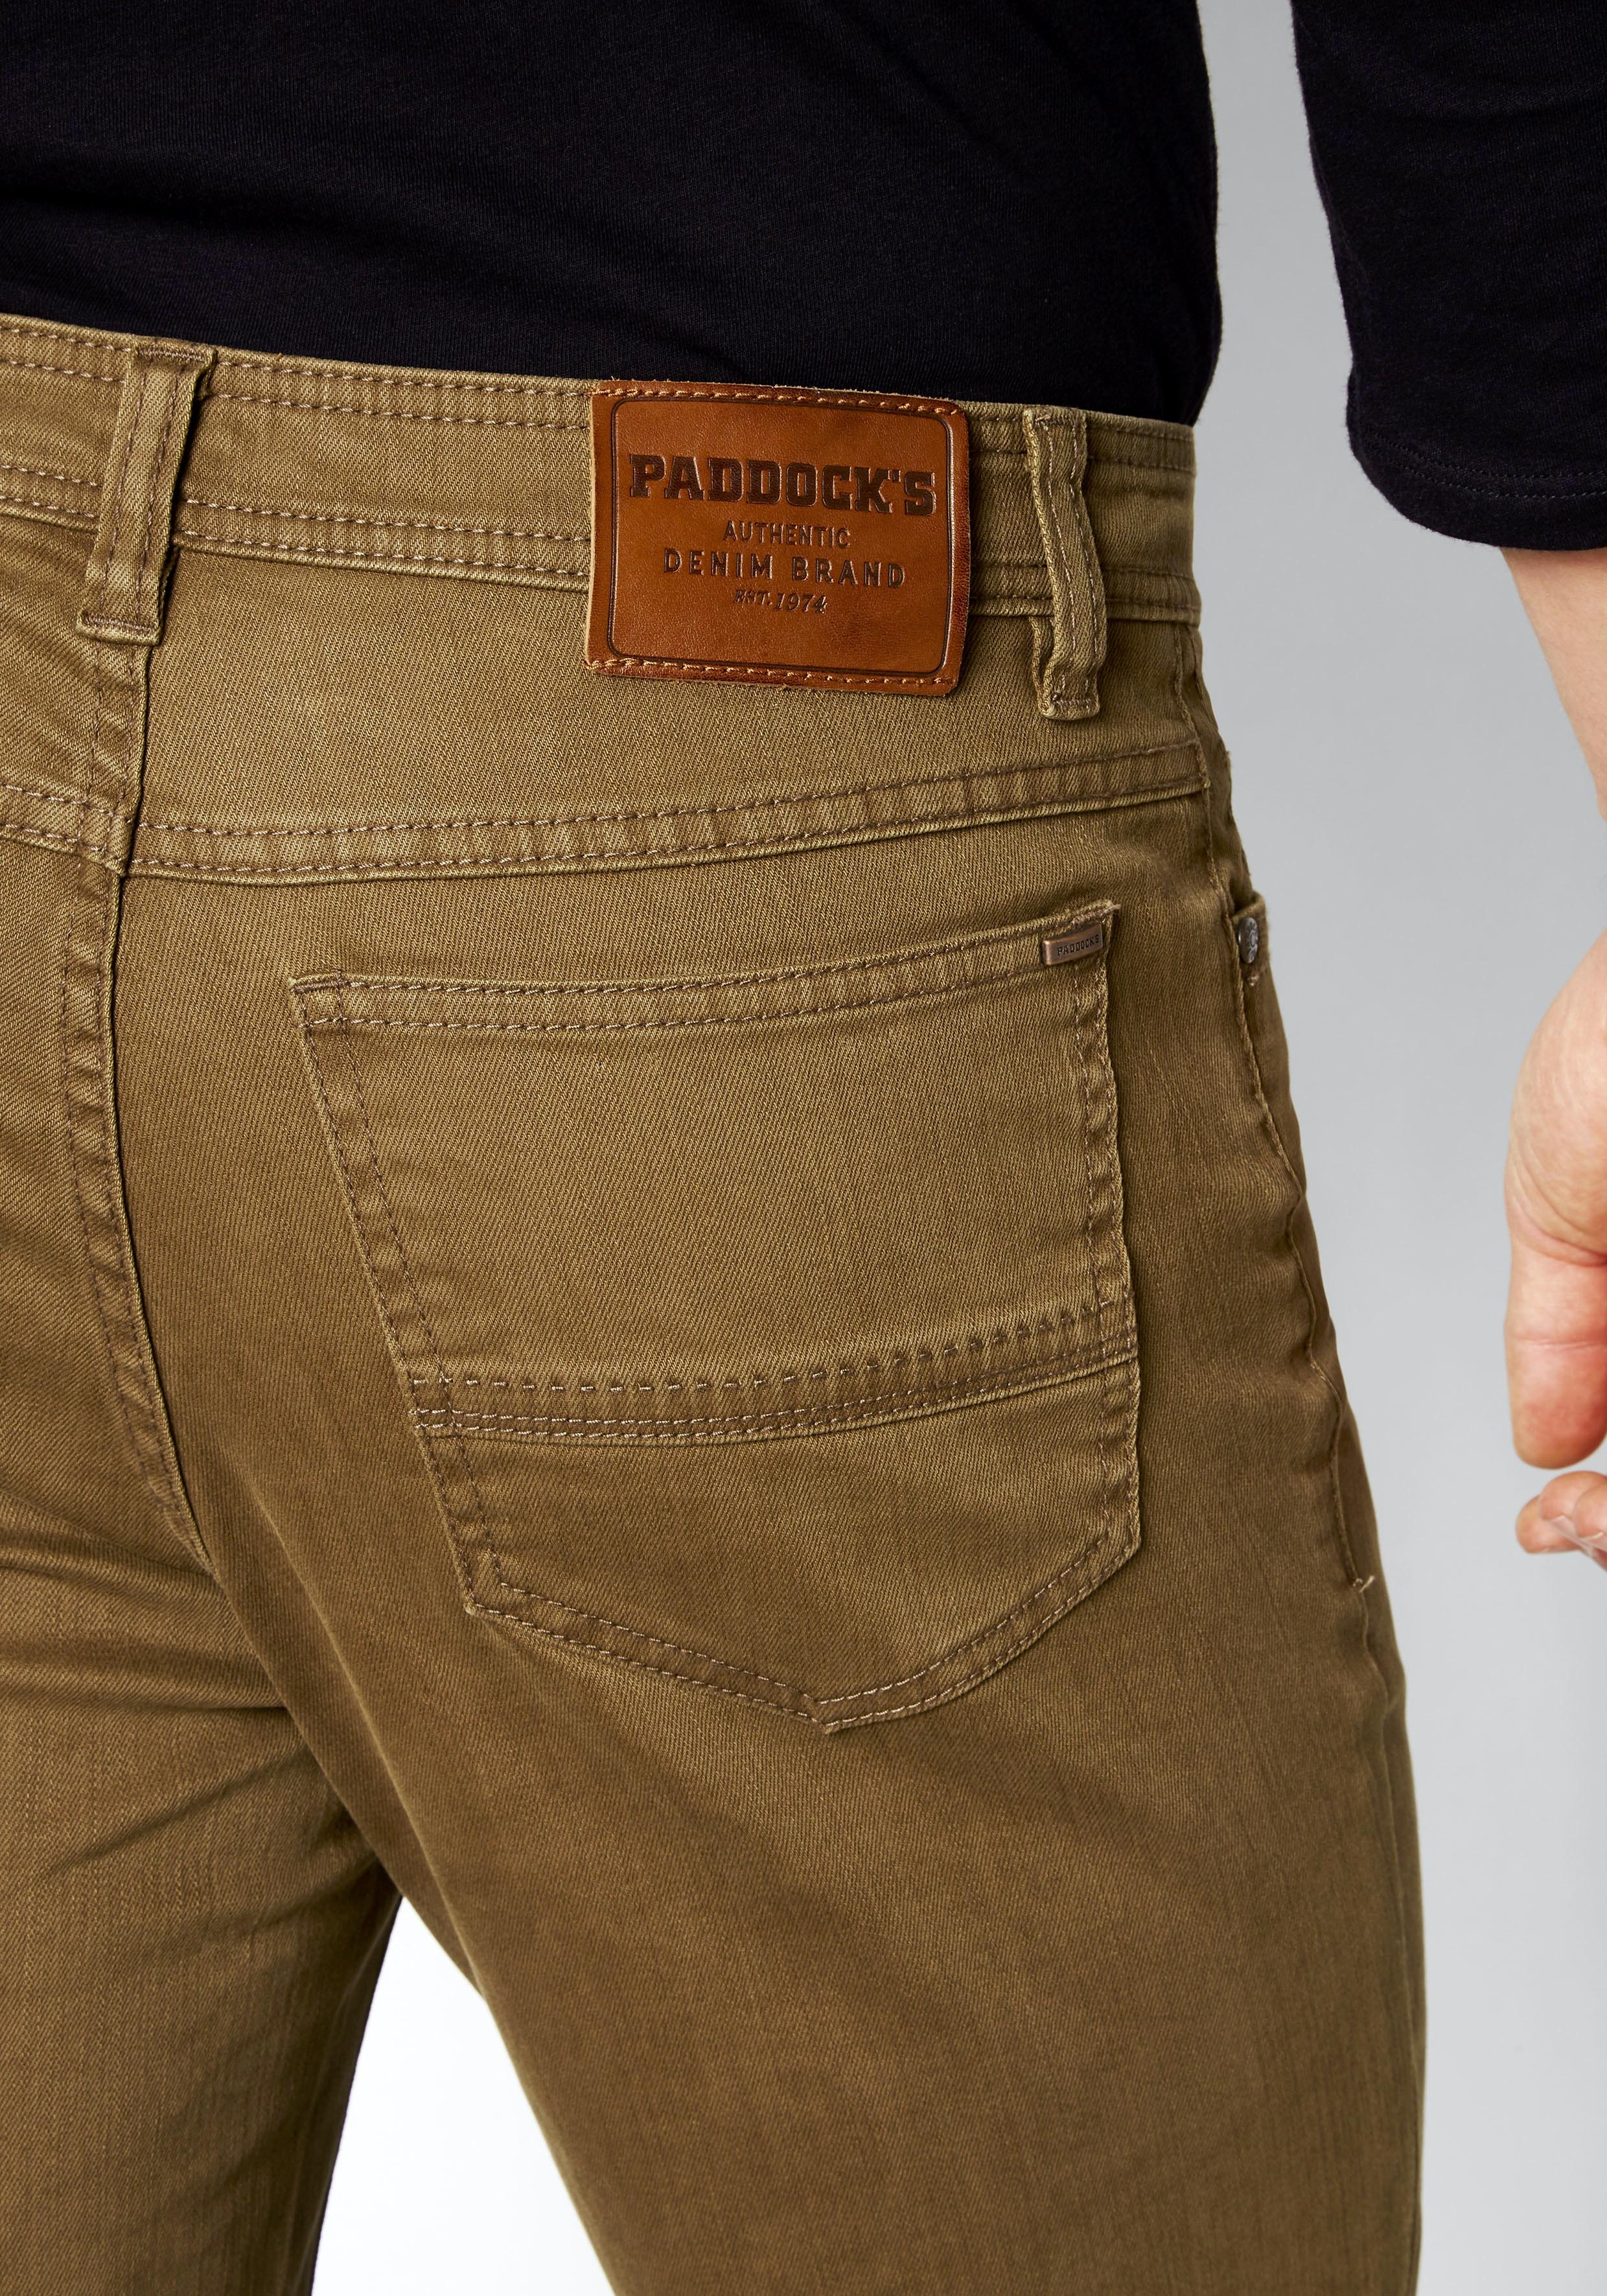 Paddock's Ranger Motion & Comfort